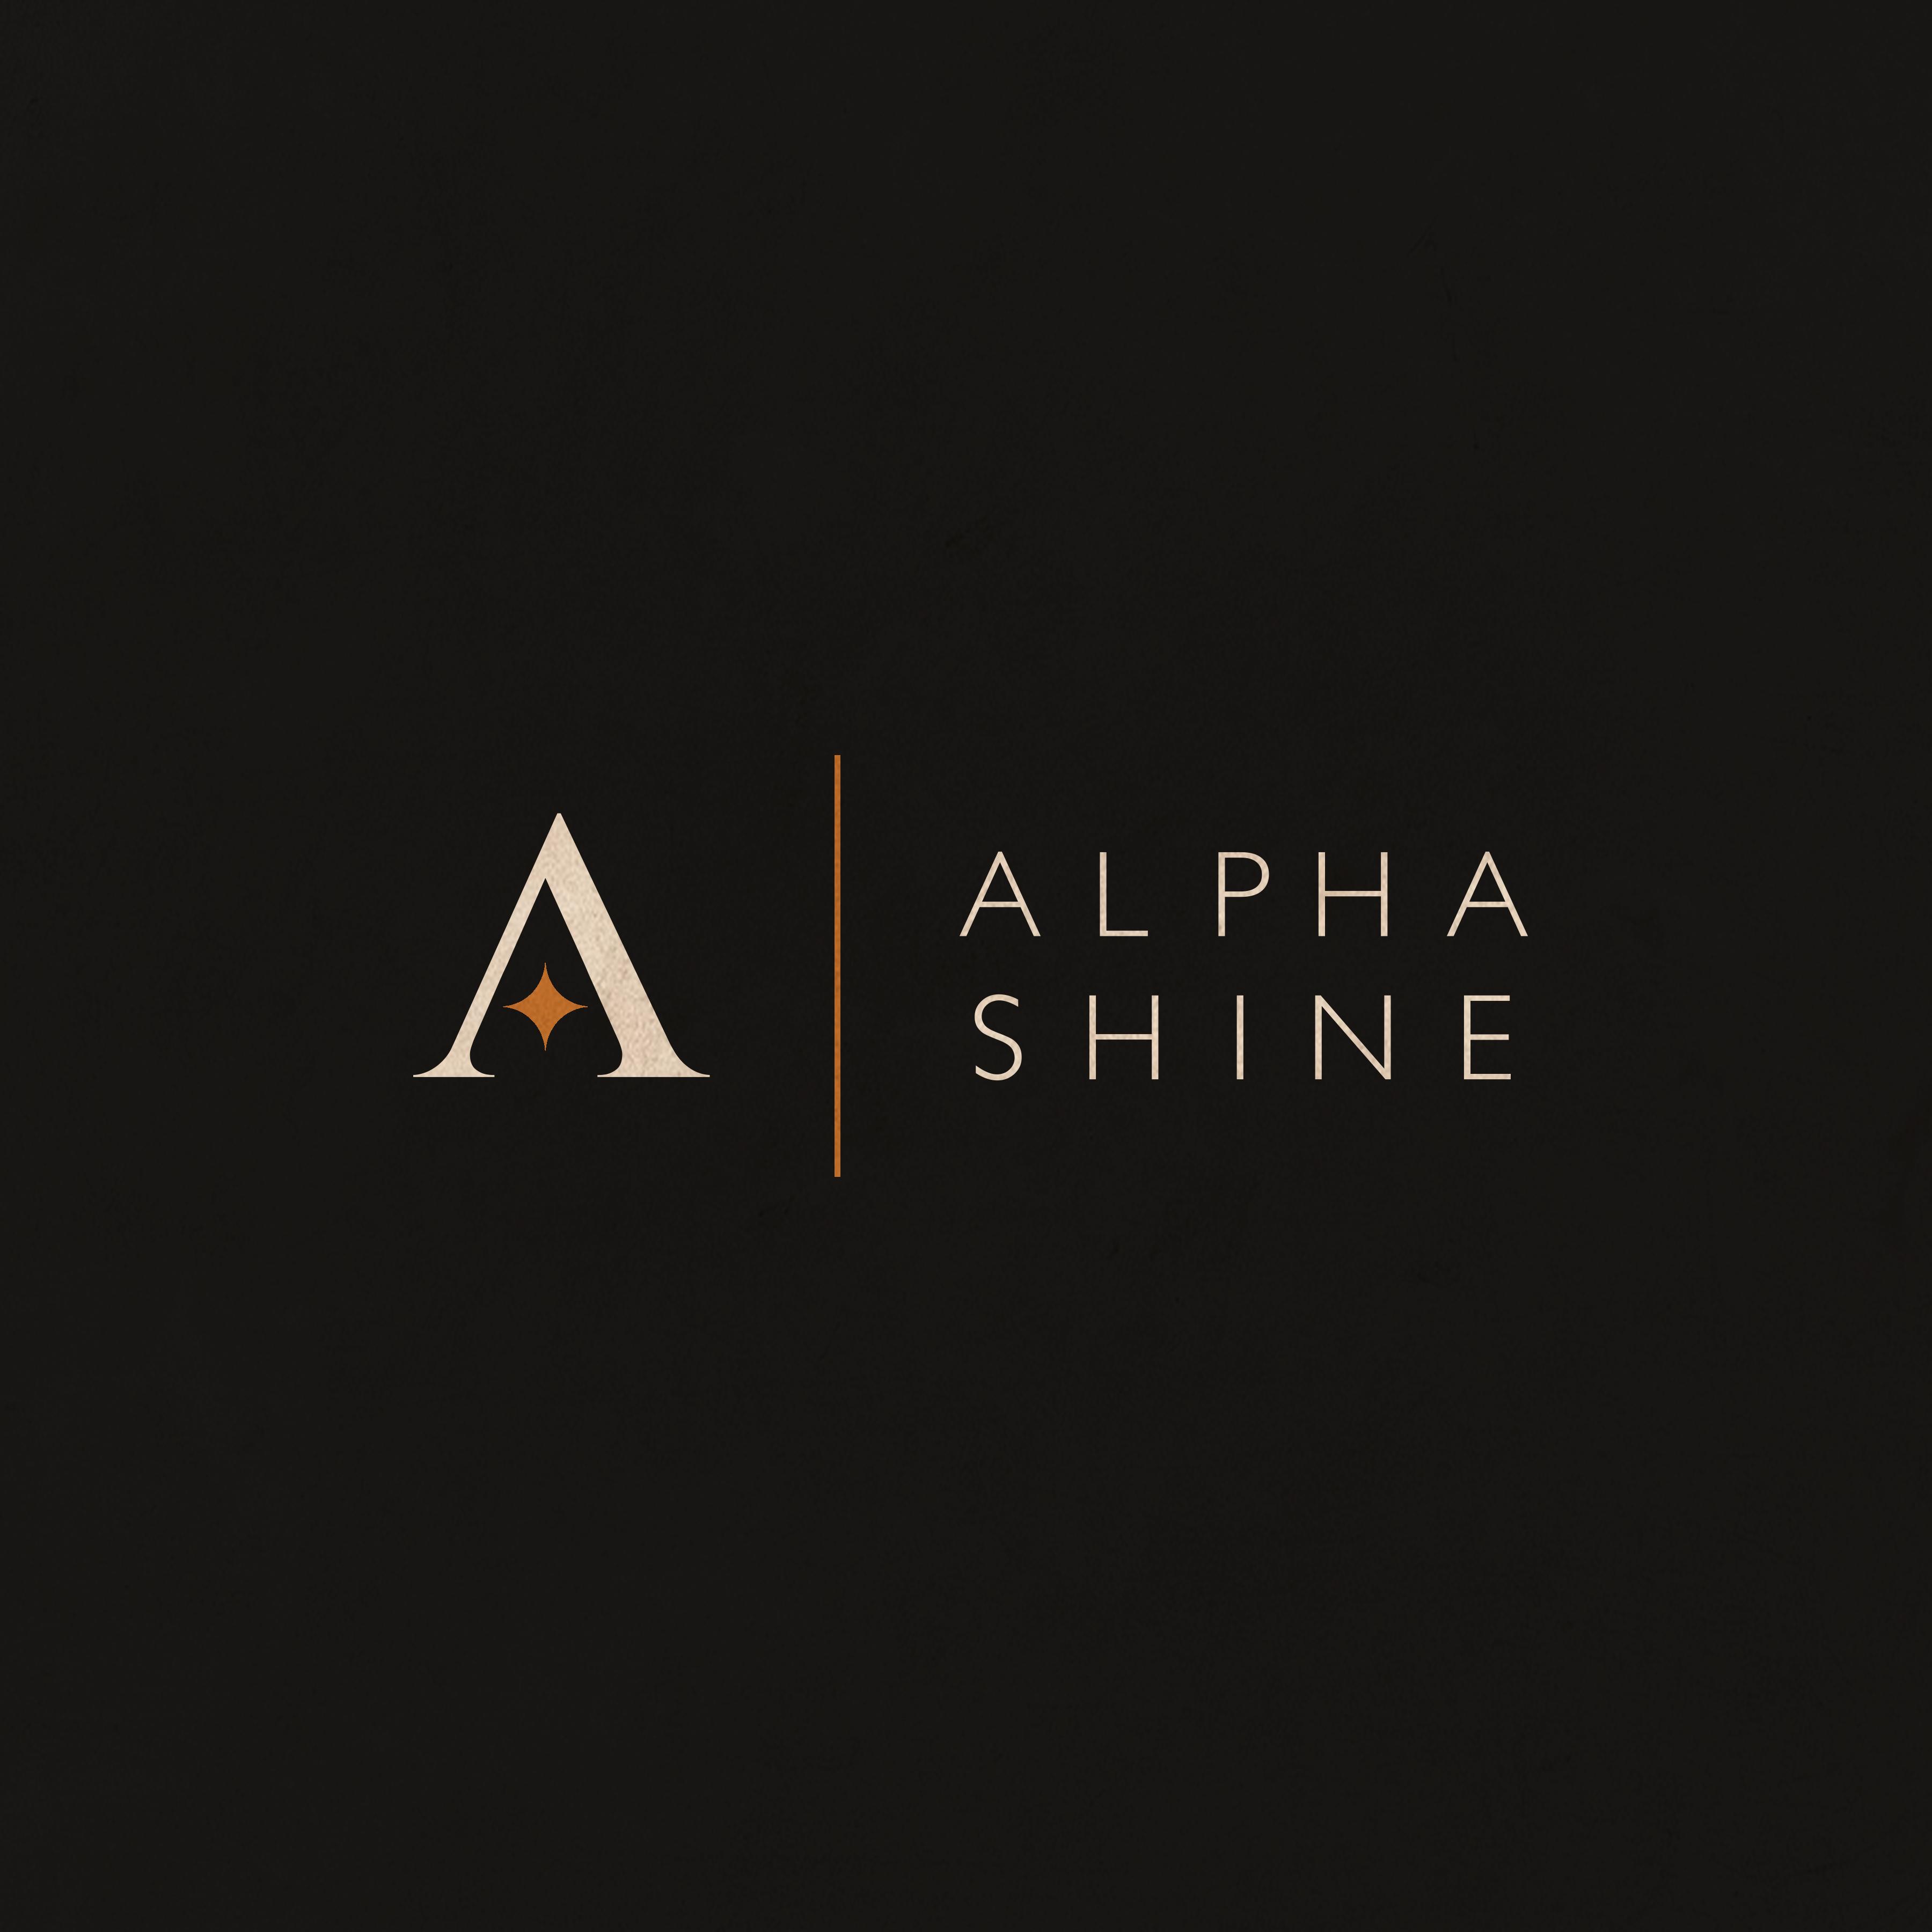 ANerdsWorld_Logos_Alphashine